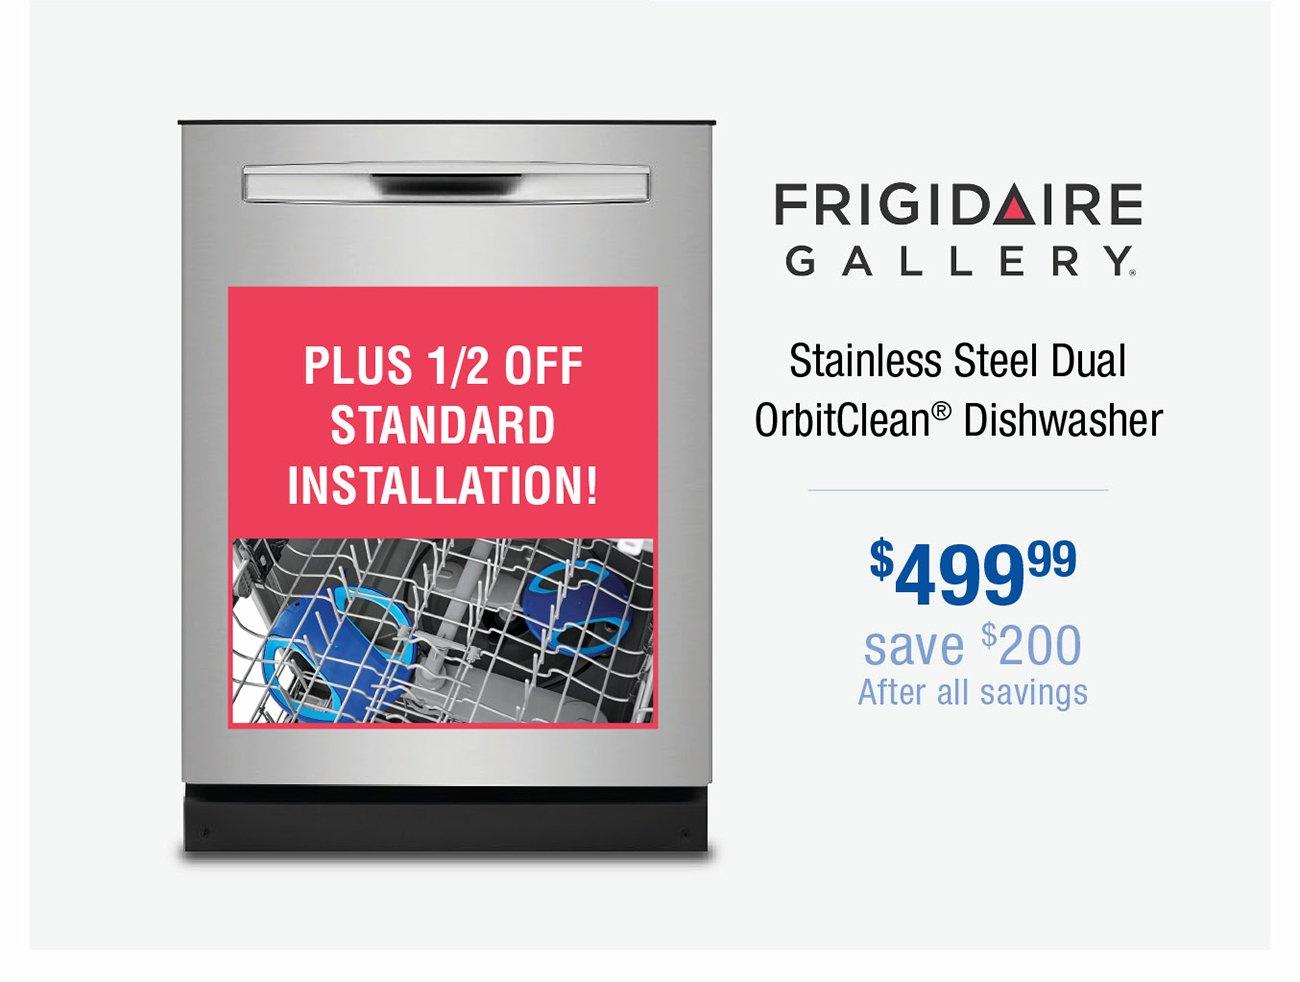 Frigidaire-galley-dishwasher